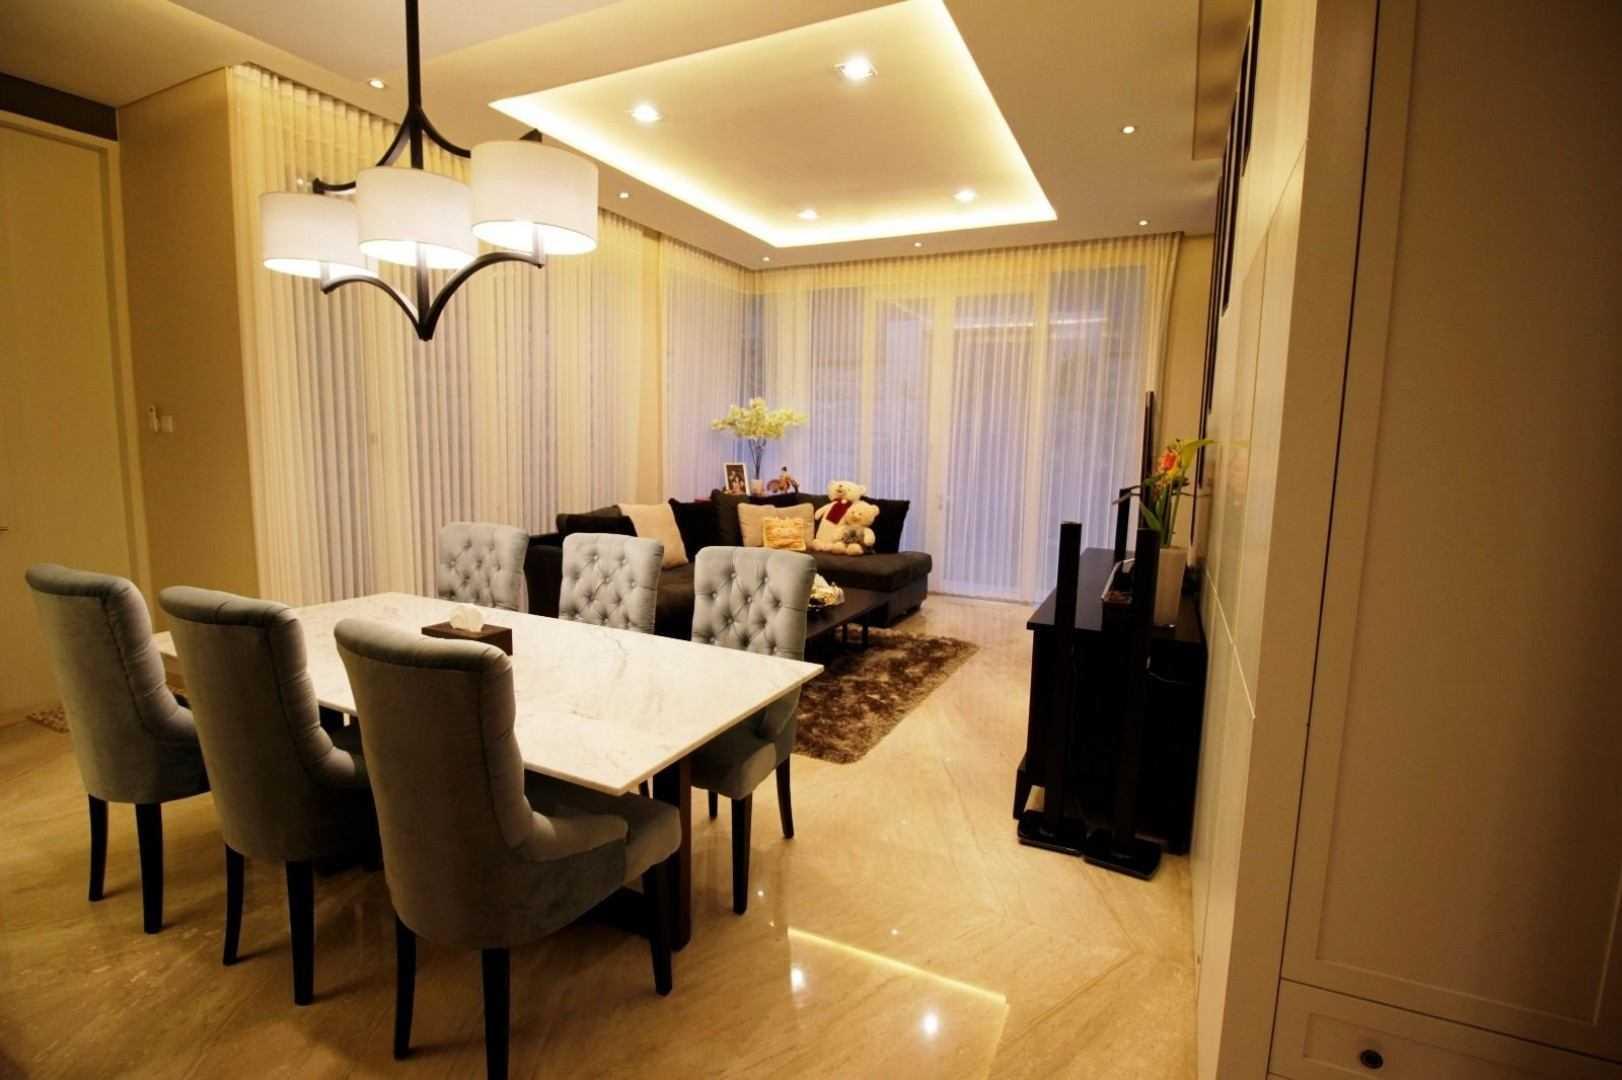 Kottagaris Interior Design Consultant Mr L Residence Surabaya, Kota Sby, Jawa Timur, Indonesia Surabaya, Kota Sby, Jawa Timur, Indonesia Dining Room Klasik 54613